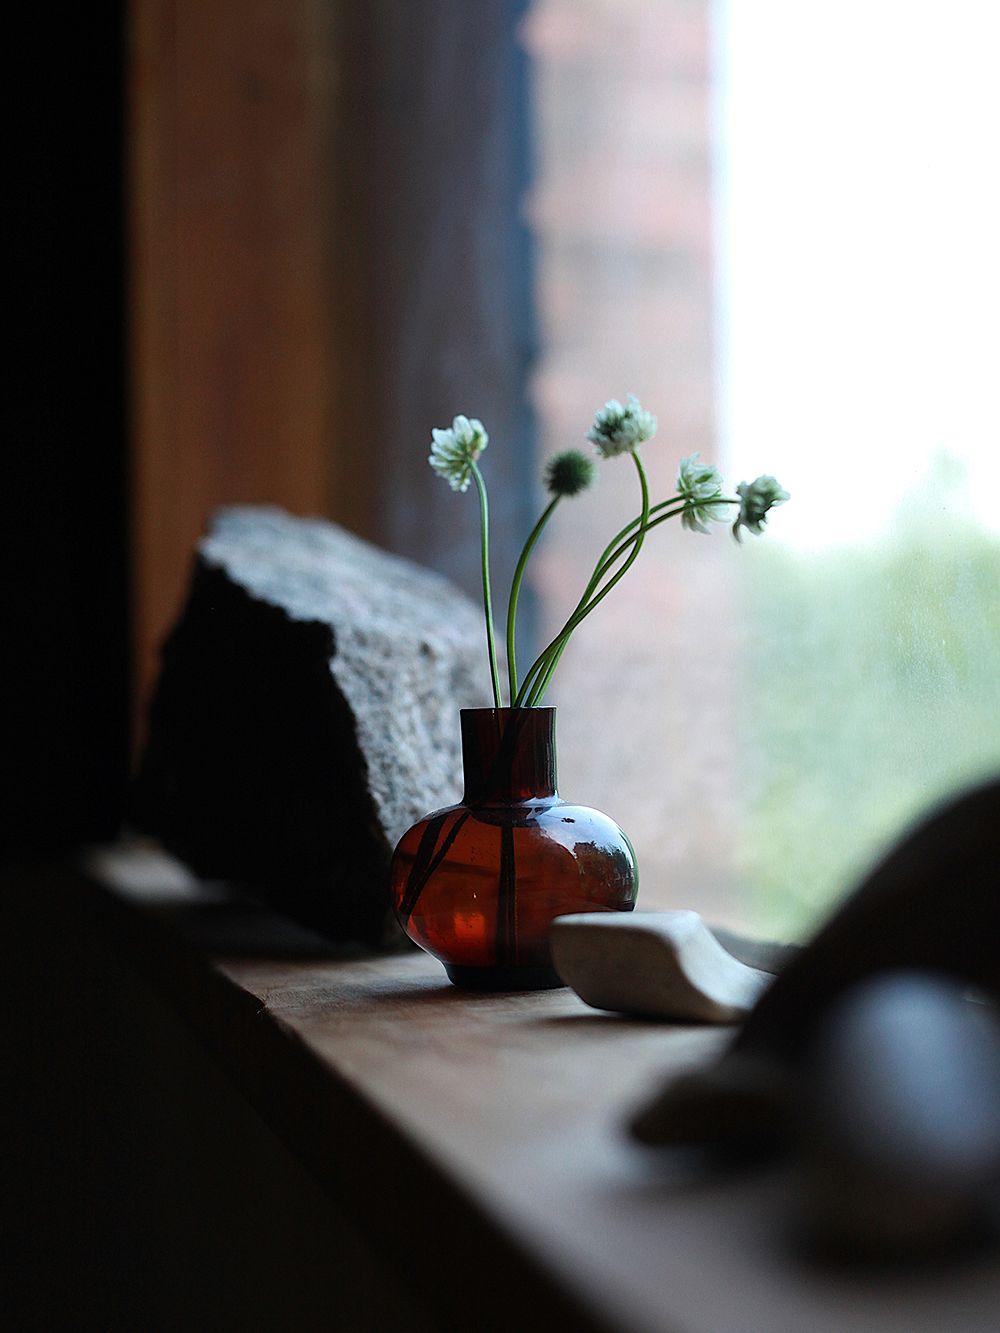 Marimekko's Mini vase